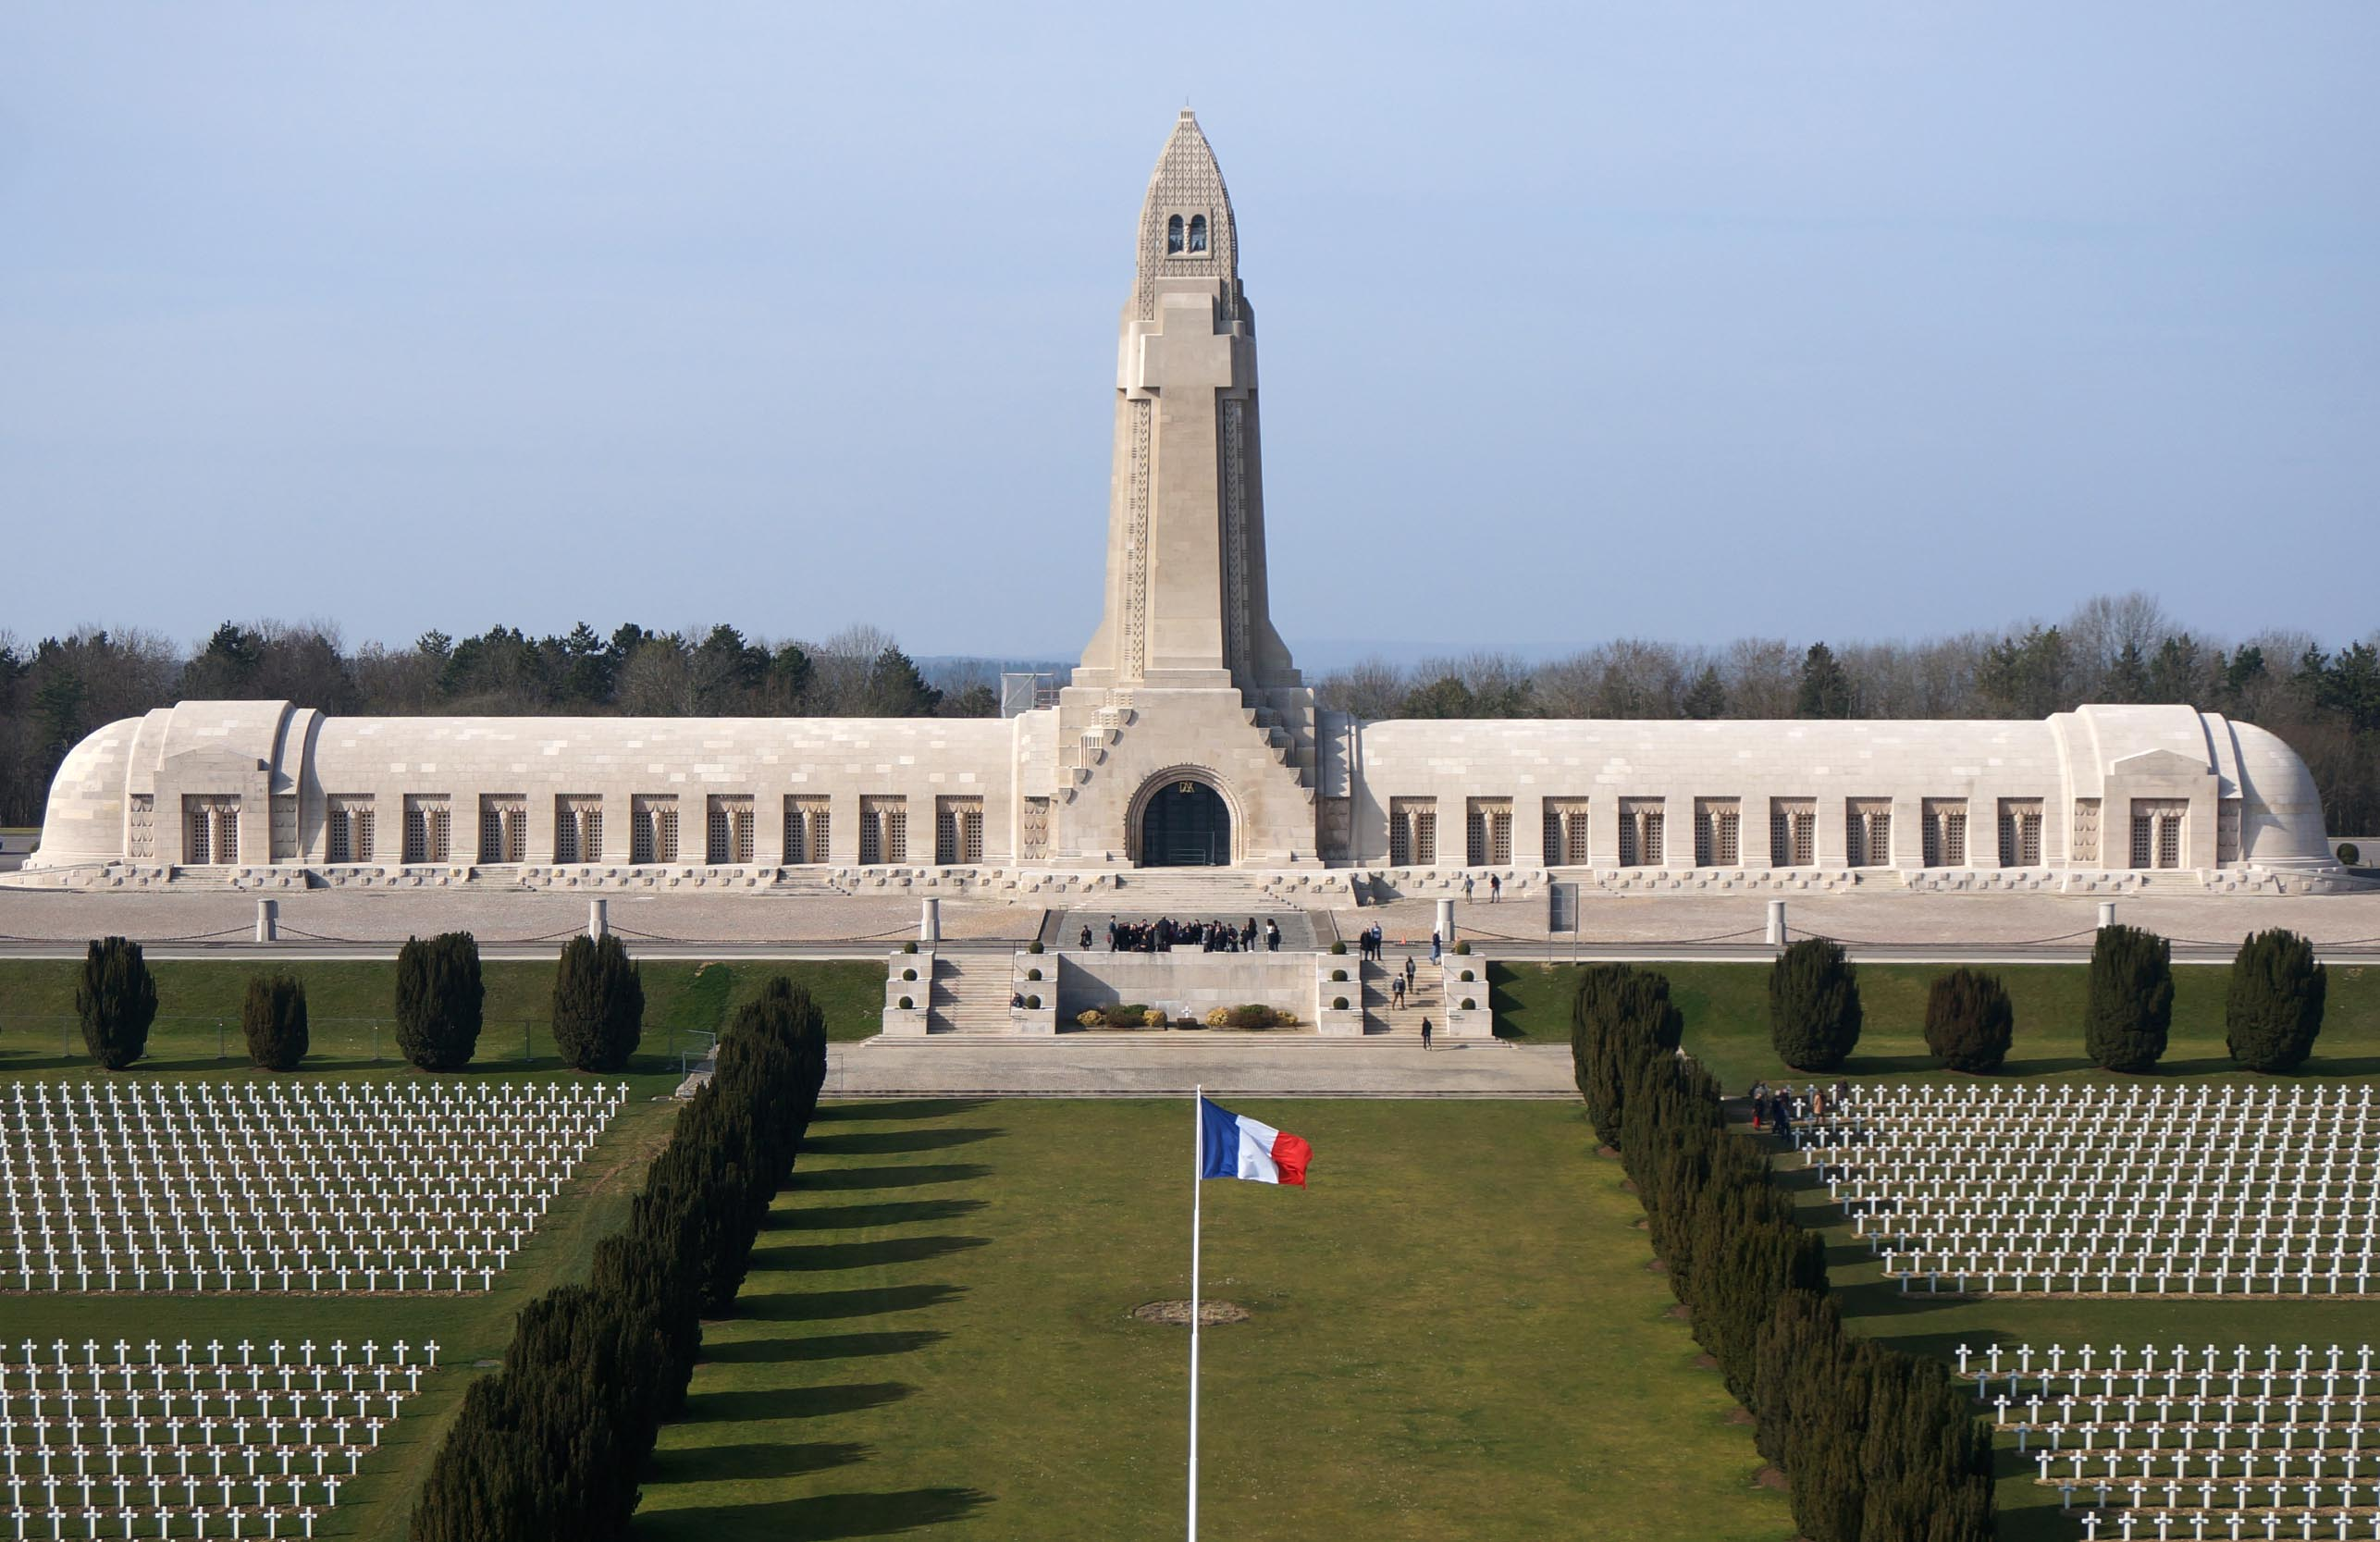 Agence Caillault ACMH – Ossuaire de Douaumont – Façade de l'ossuaire restaurée